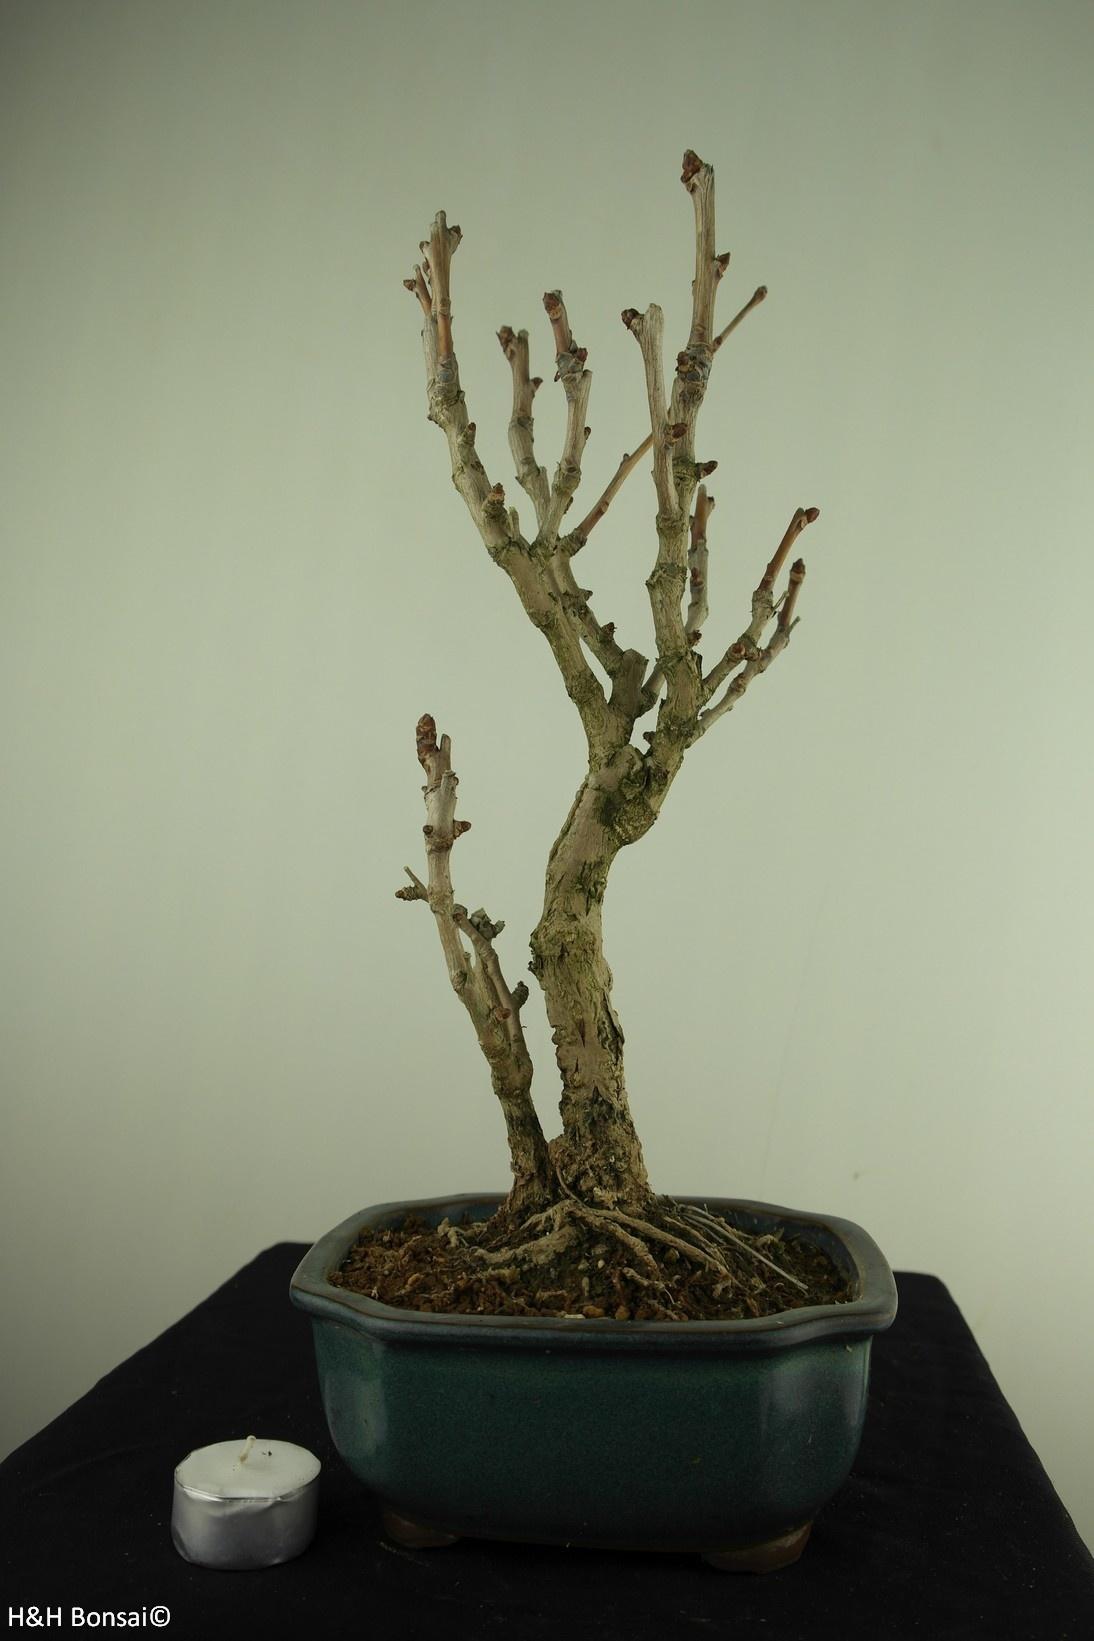 Bonsai Fächerblattbaum,Ginkgo biloba, nr. 7795